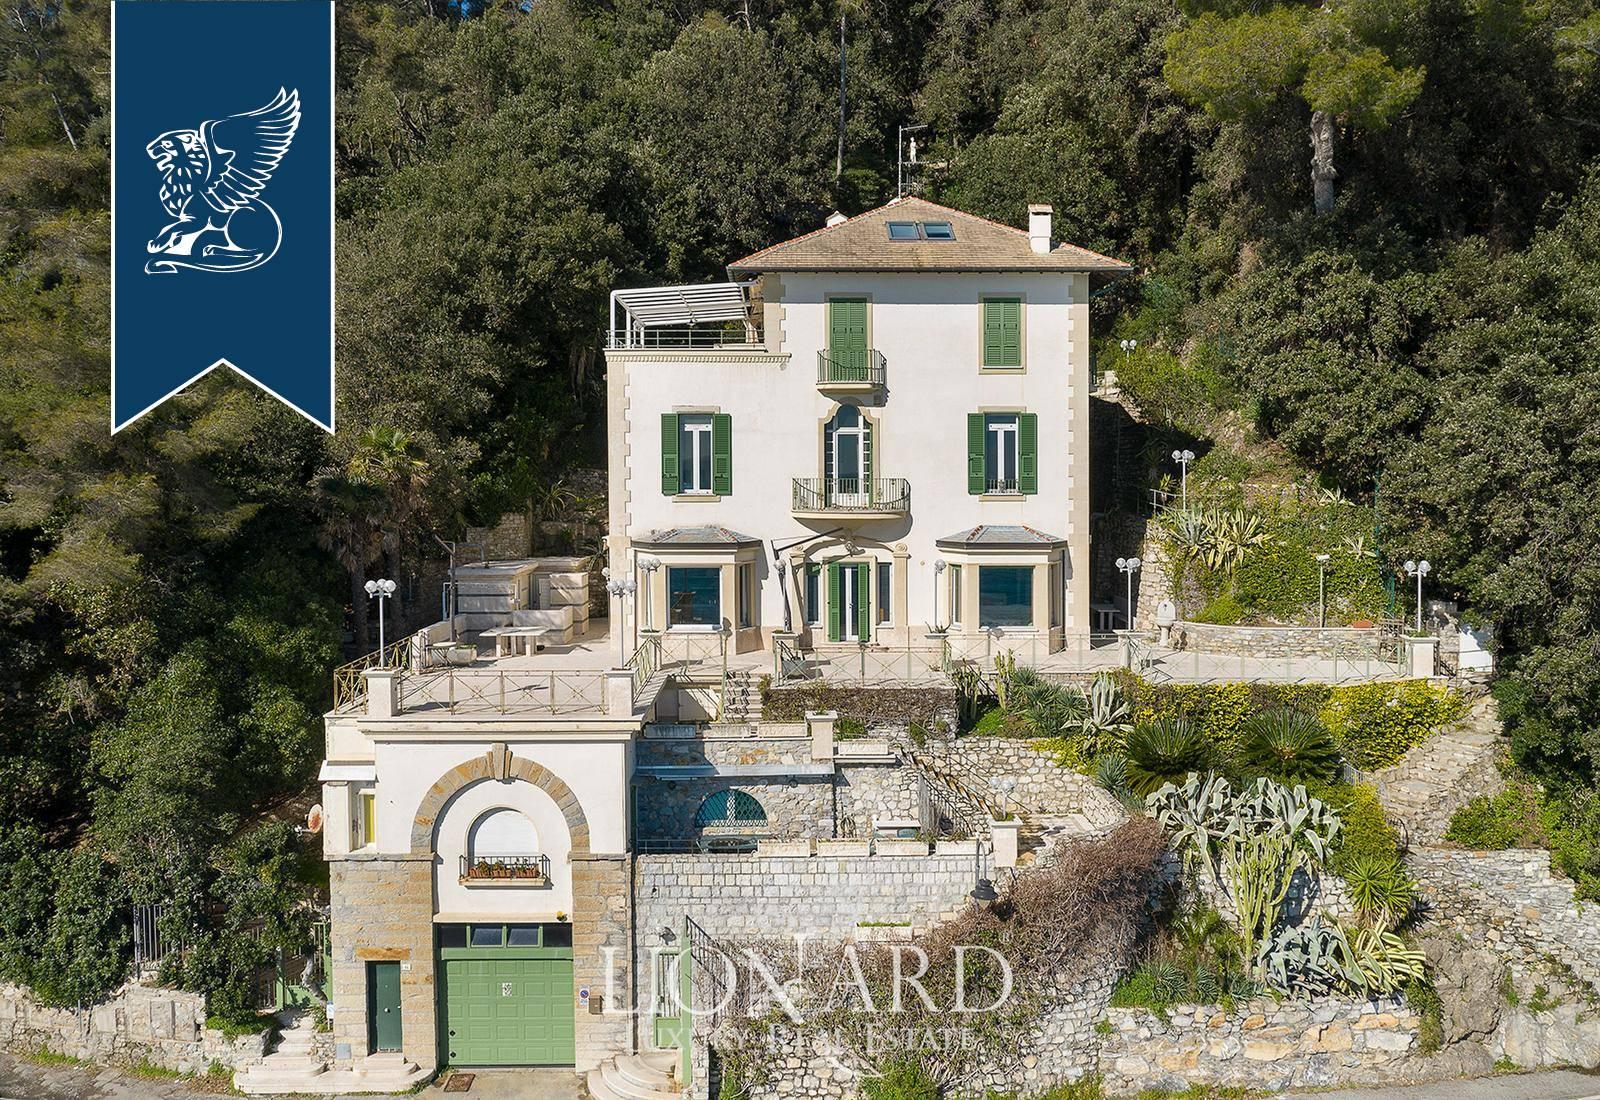 Villa in Vendita a Santa Margherita Ligure: 0 locali, 607 mq - Foto 6